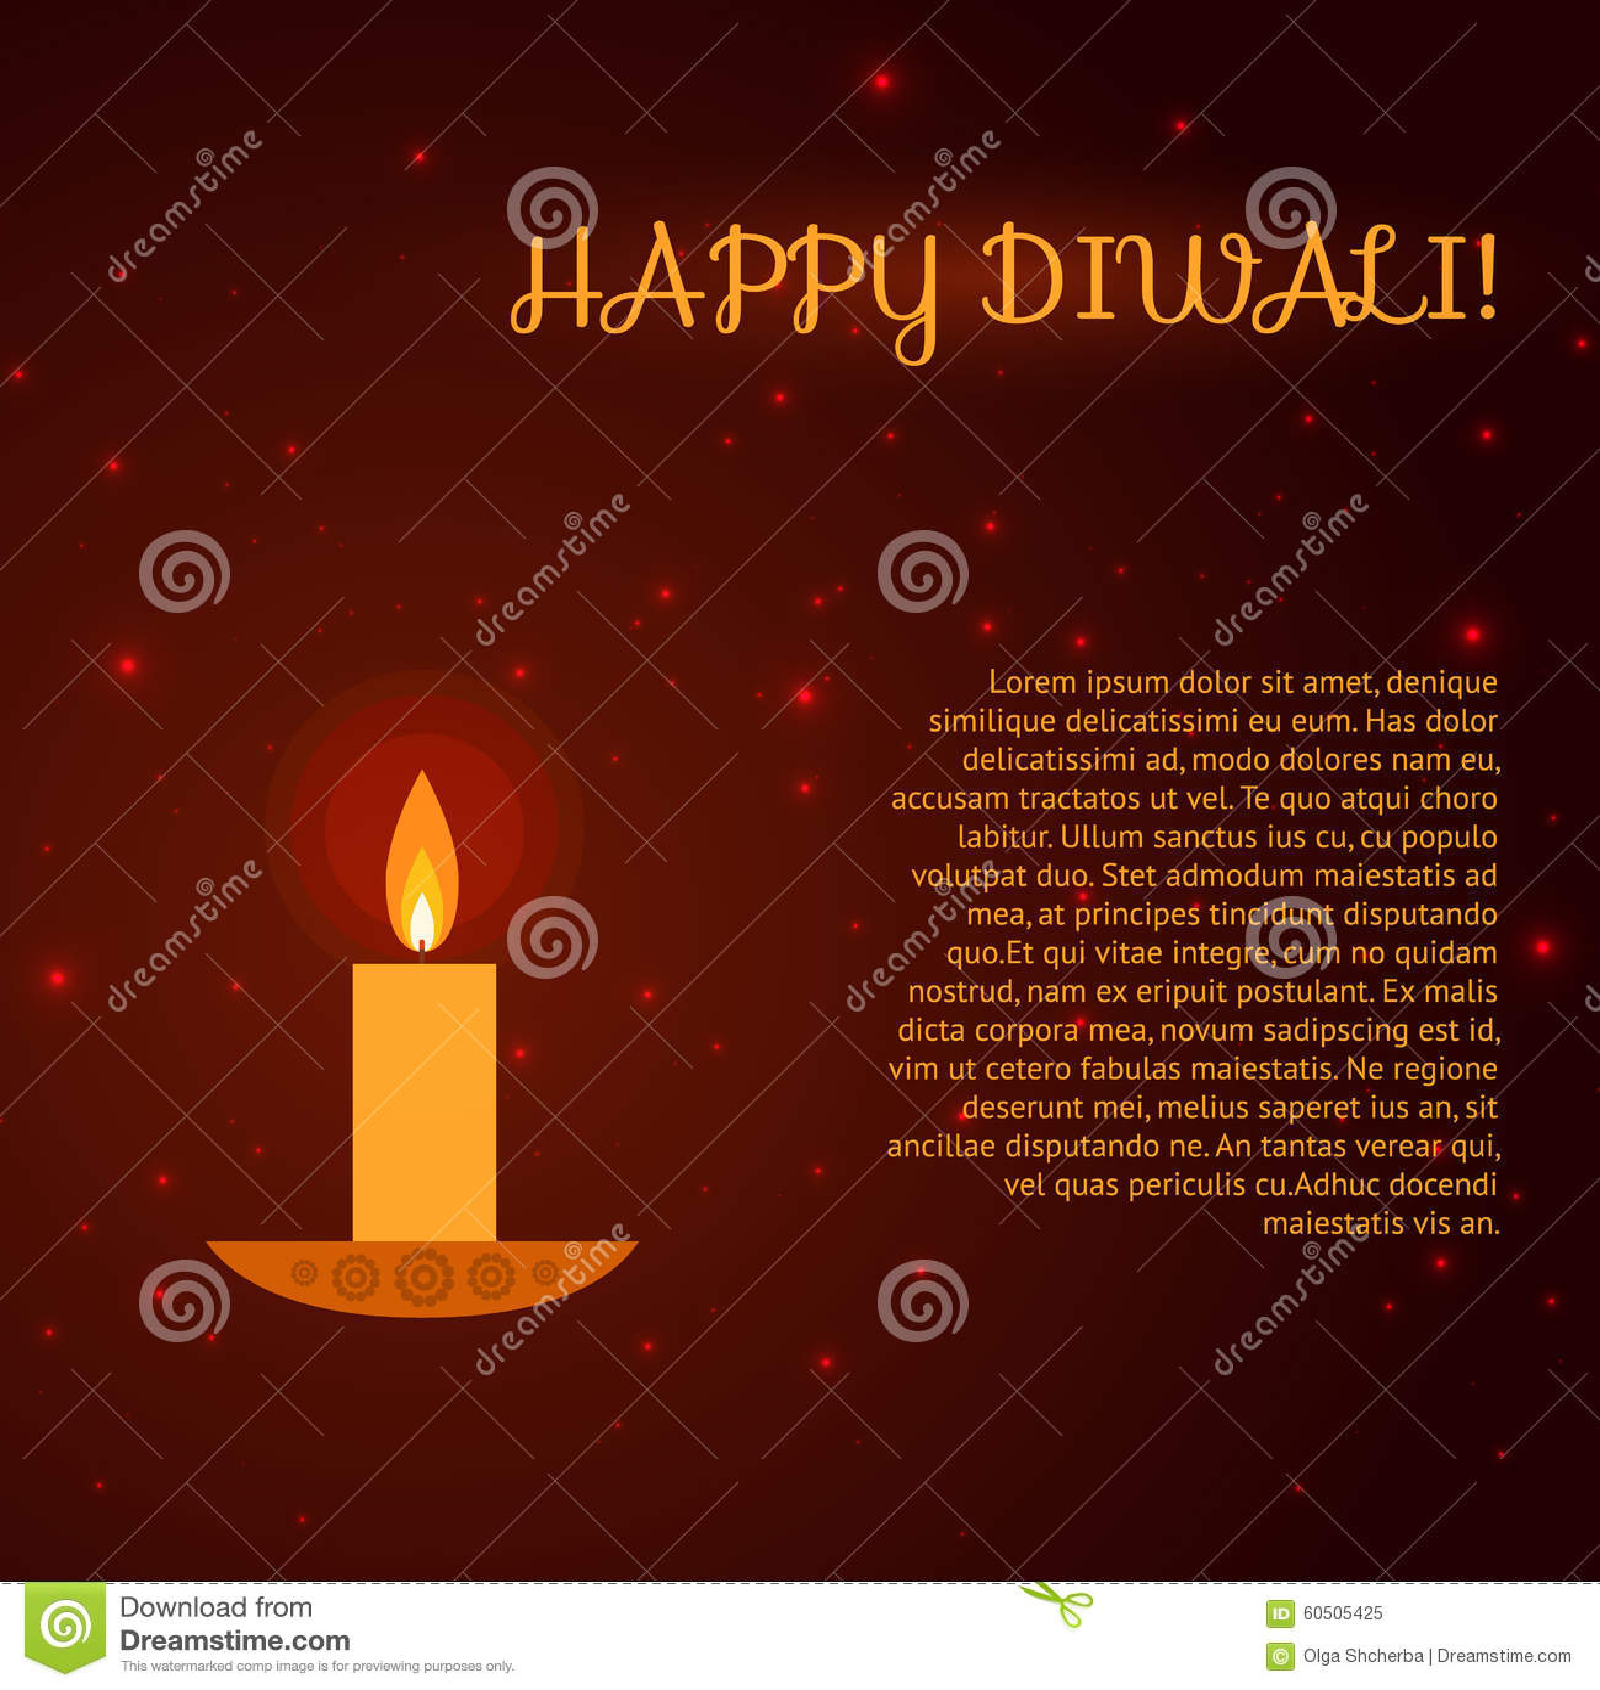 Diwali Greeting Card Stock Vector Illustration Of Happy 60505425